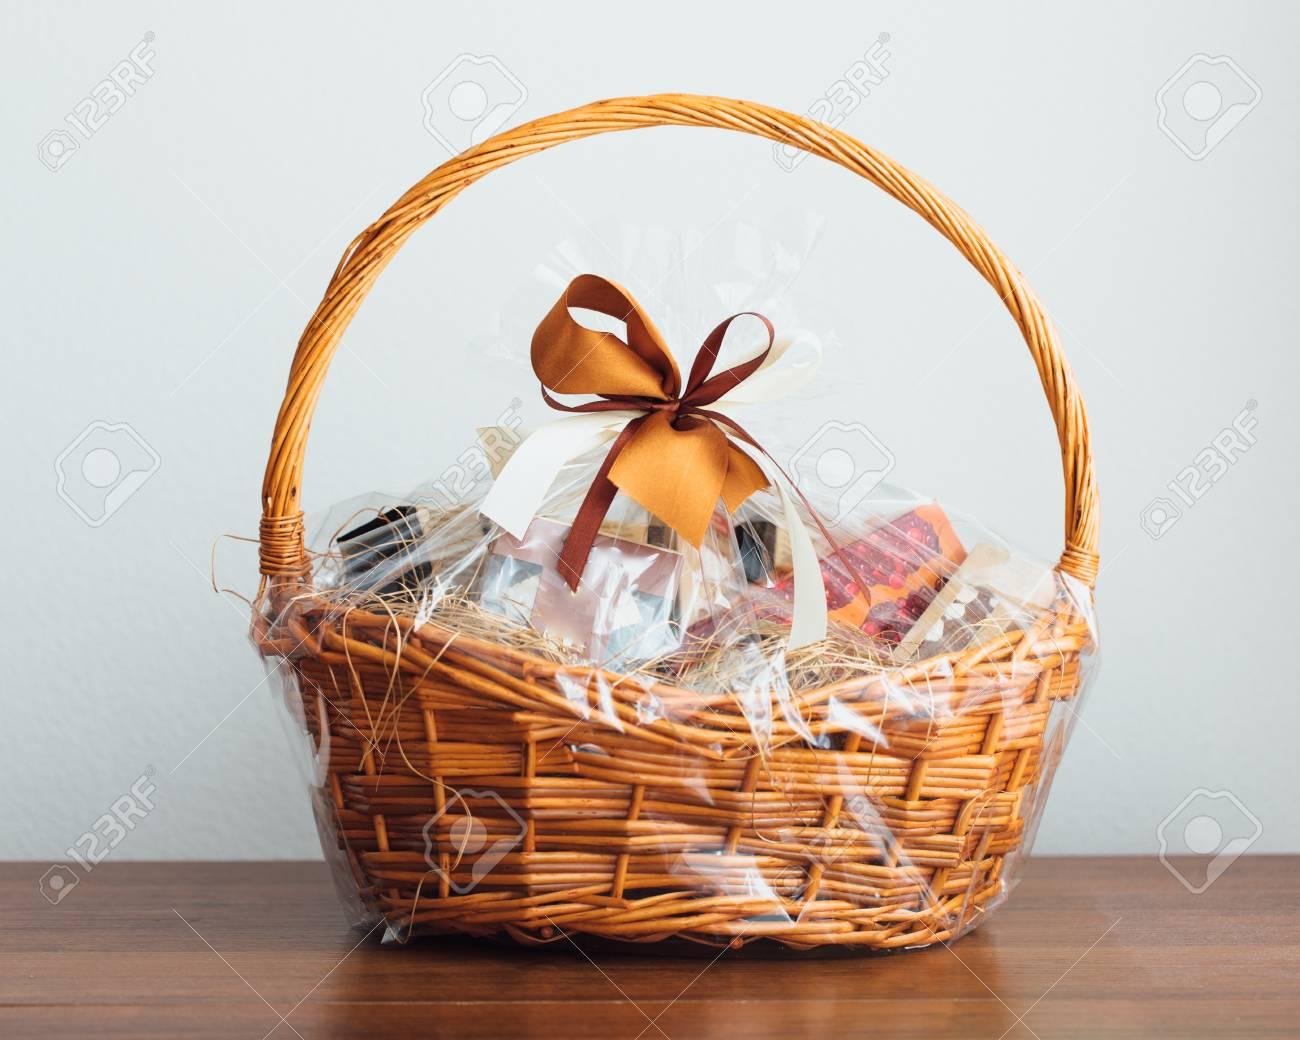 gift basket on grey background - 80707282